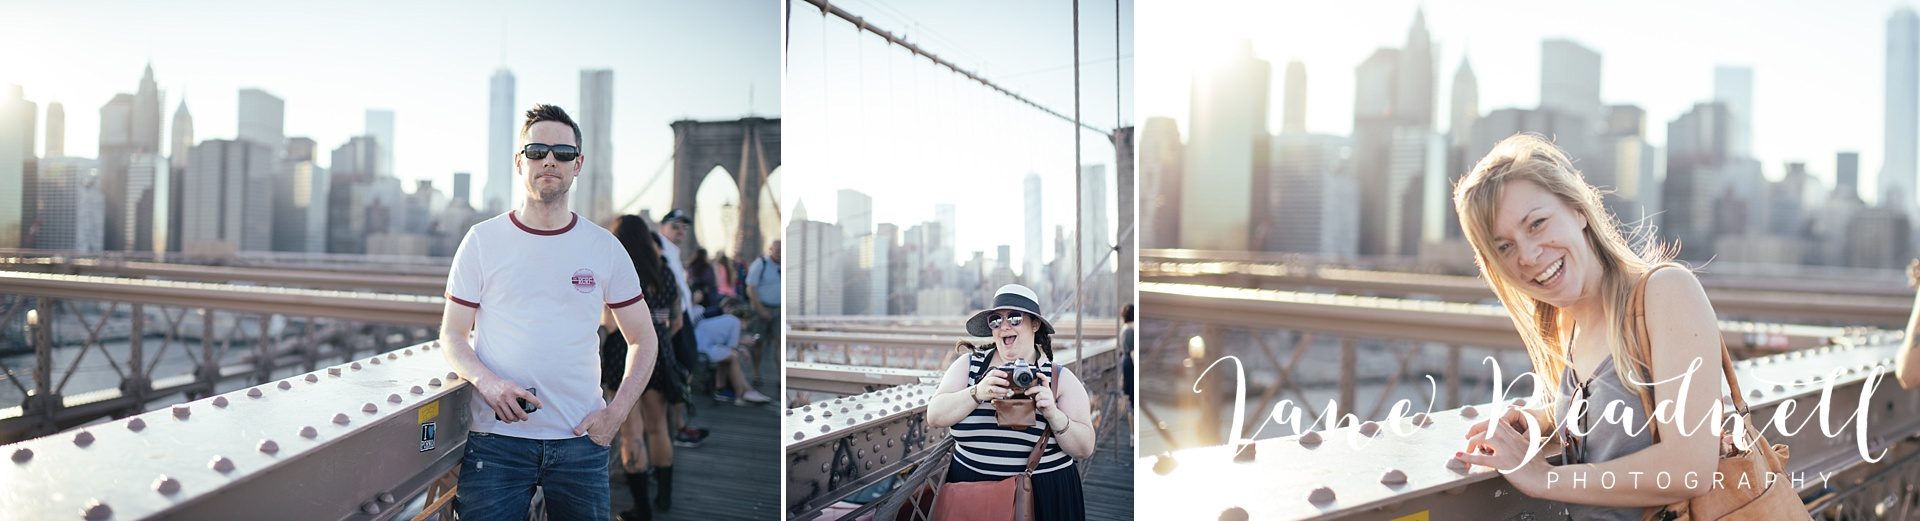 New York wedding photographer Jane Beadnell photography_0031